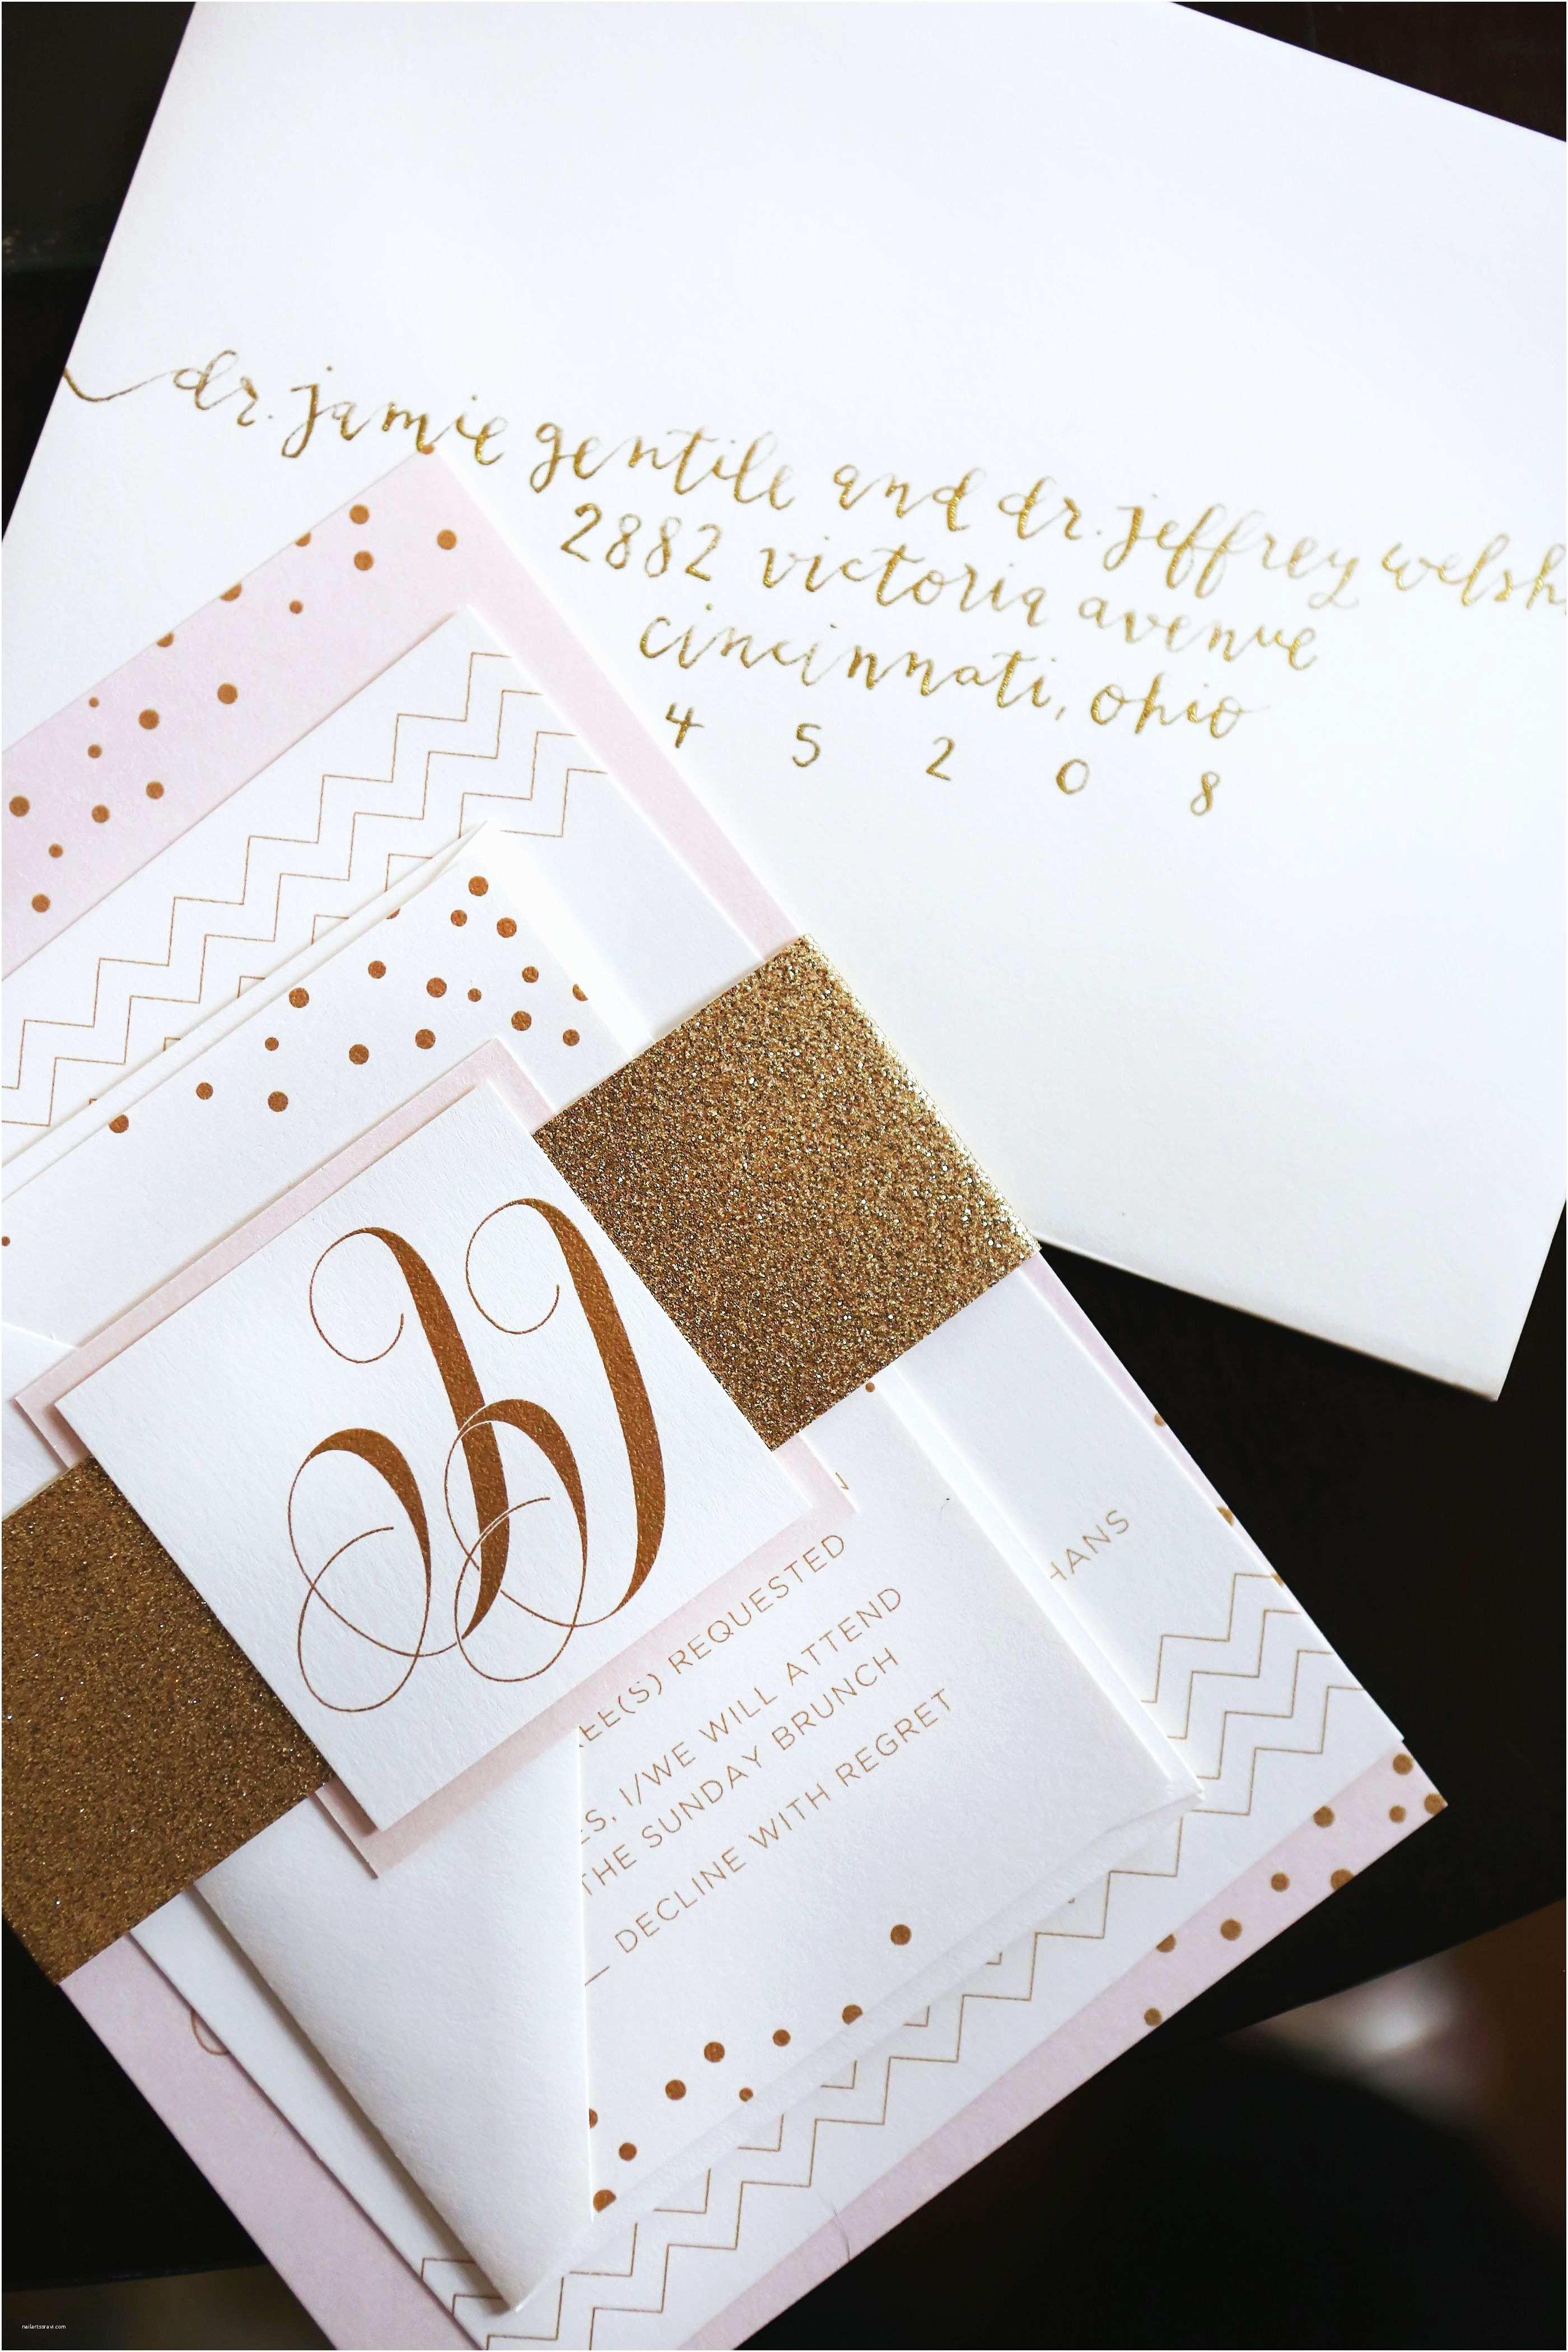 White and Gold Wedding Invitations White Gold and Blush Wedding Invitations